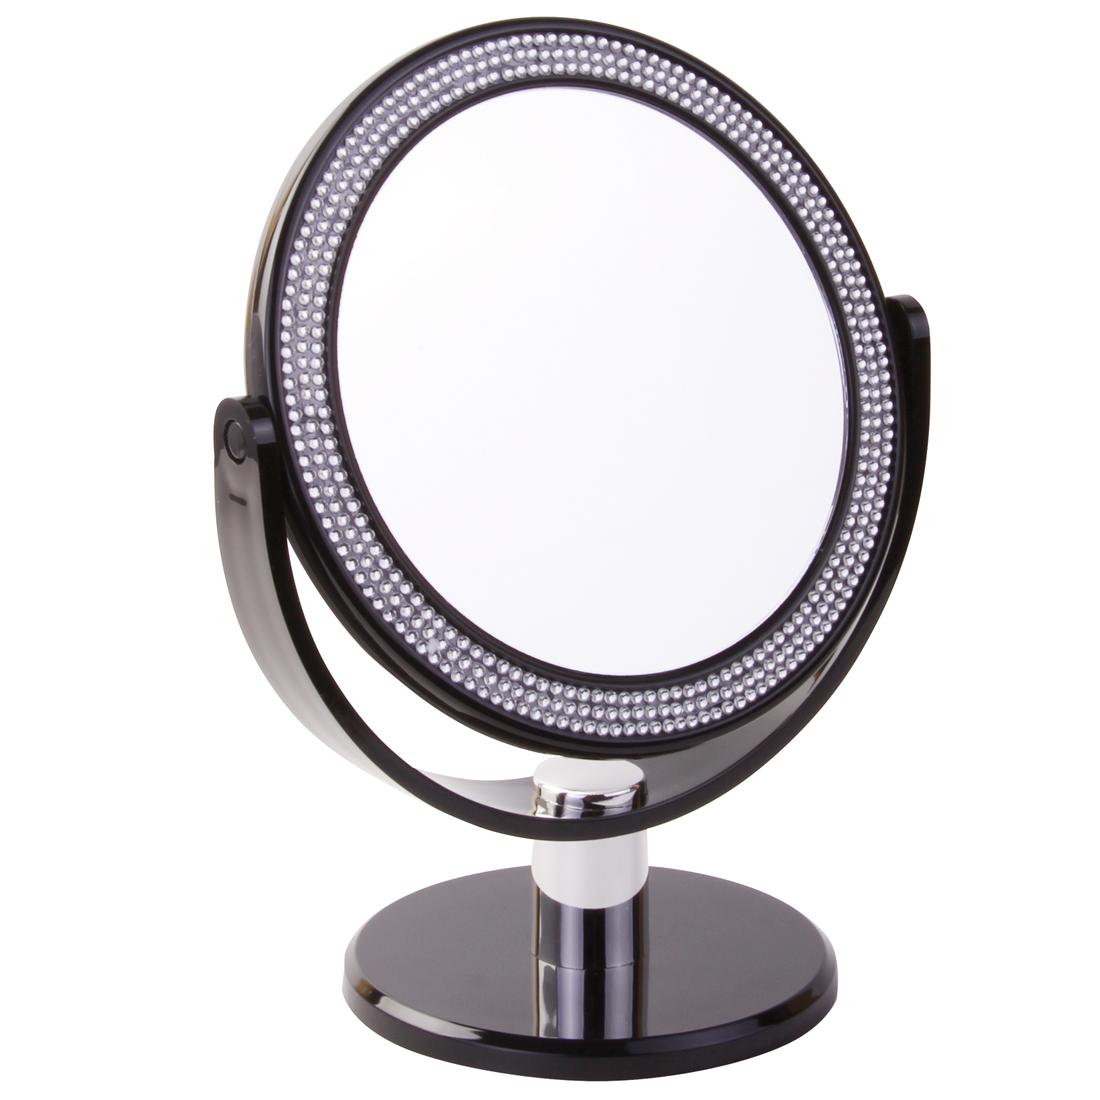 931 16 blk - Black Crystal 5x Mirror - 931/16